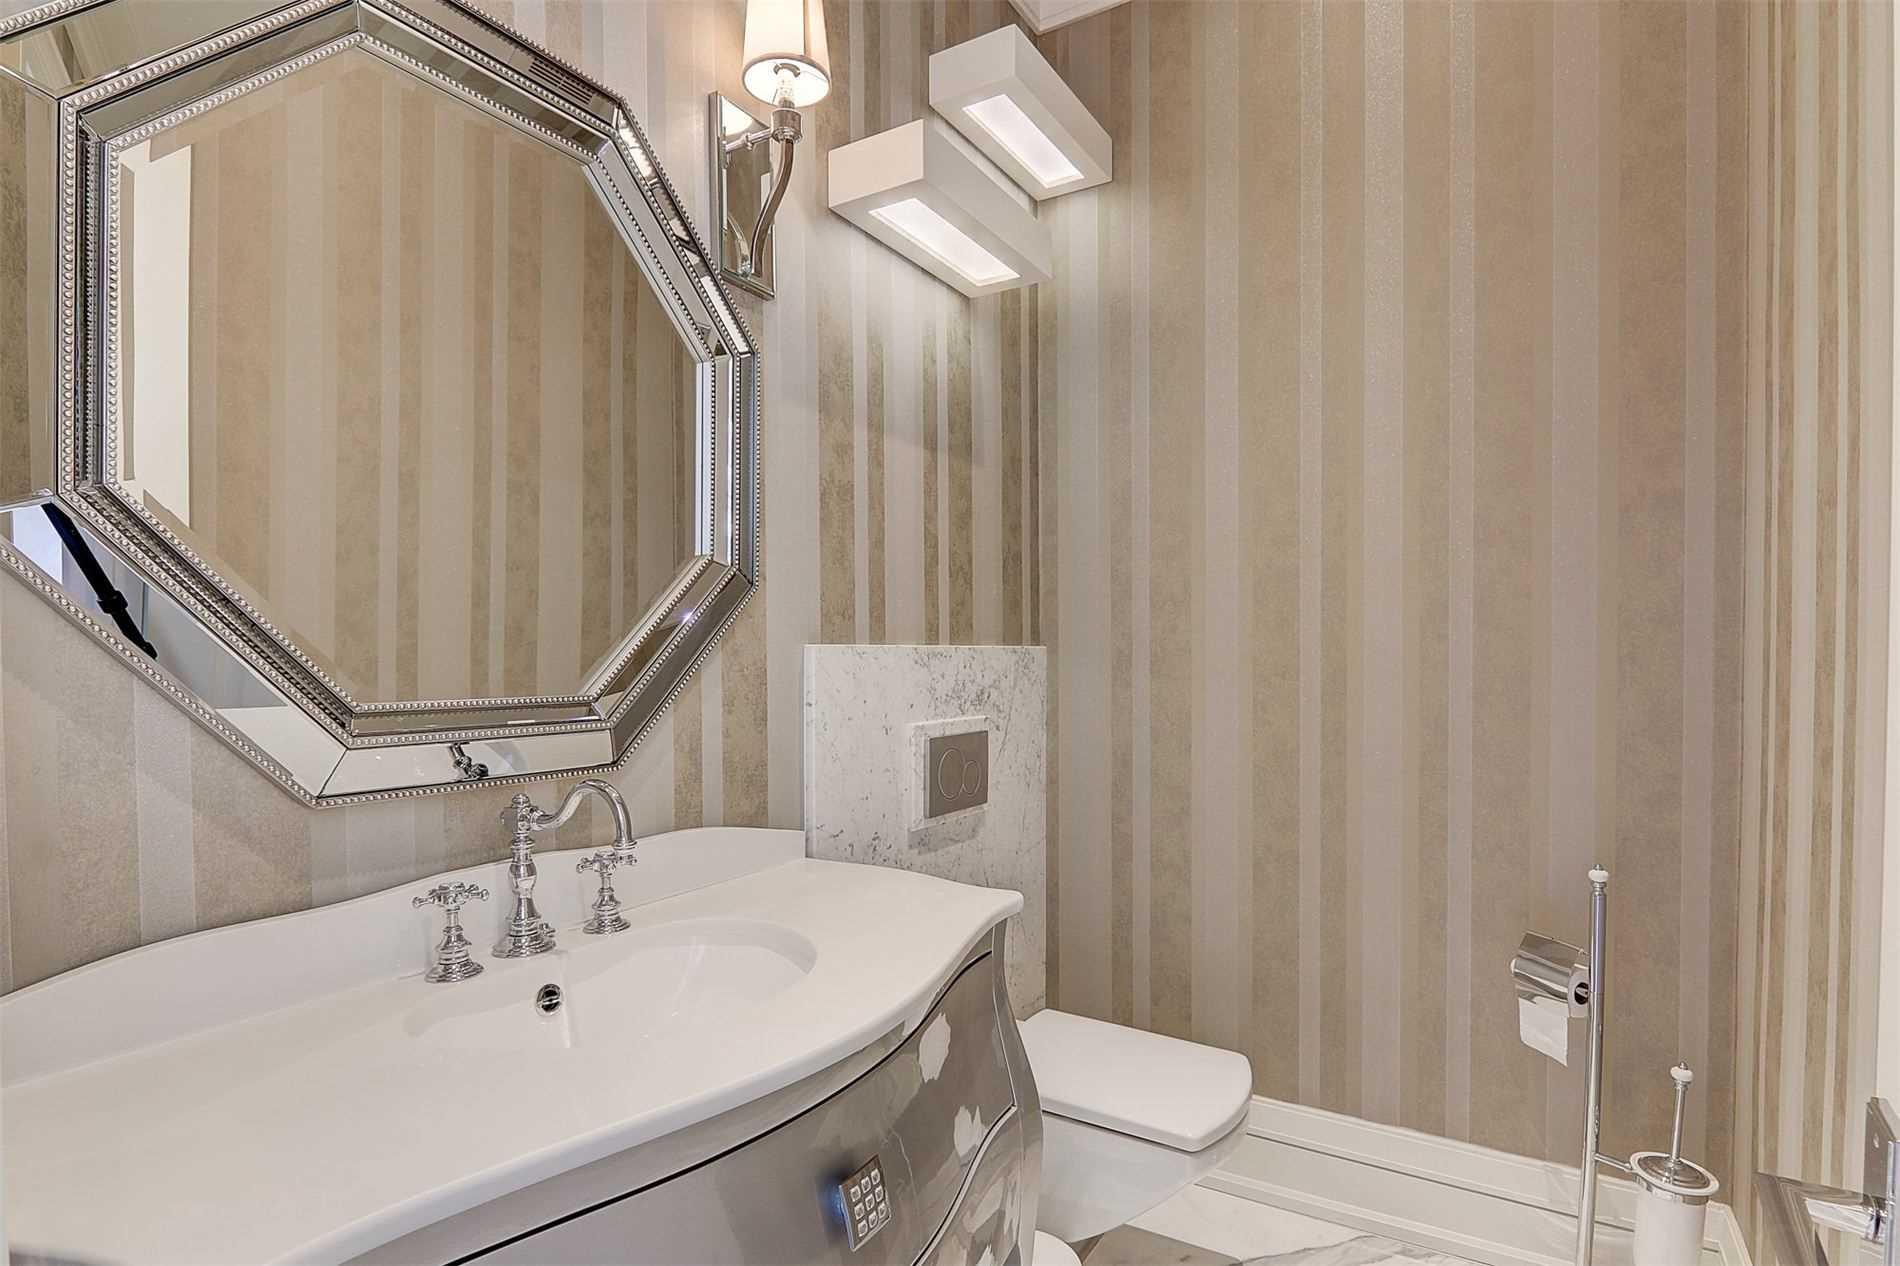 194 Burbank Dr, Toronto, Ontario M2K1P6, 5 Bedrooms Bedrooms, 10 Rooms Rooms,7 BathroomsBathrooms,Detached,For Sale,Burbank,C5305755